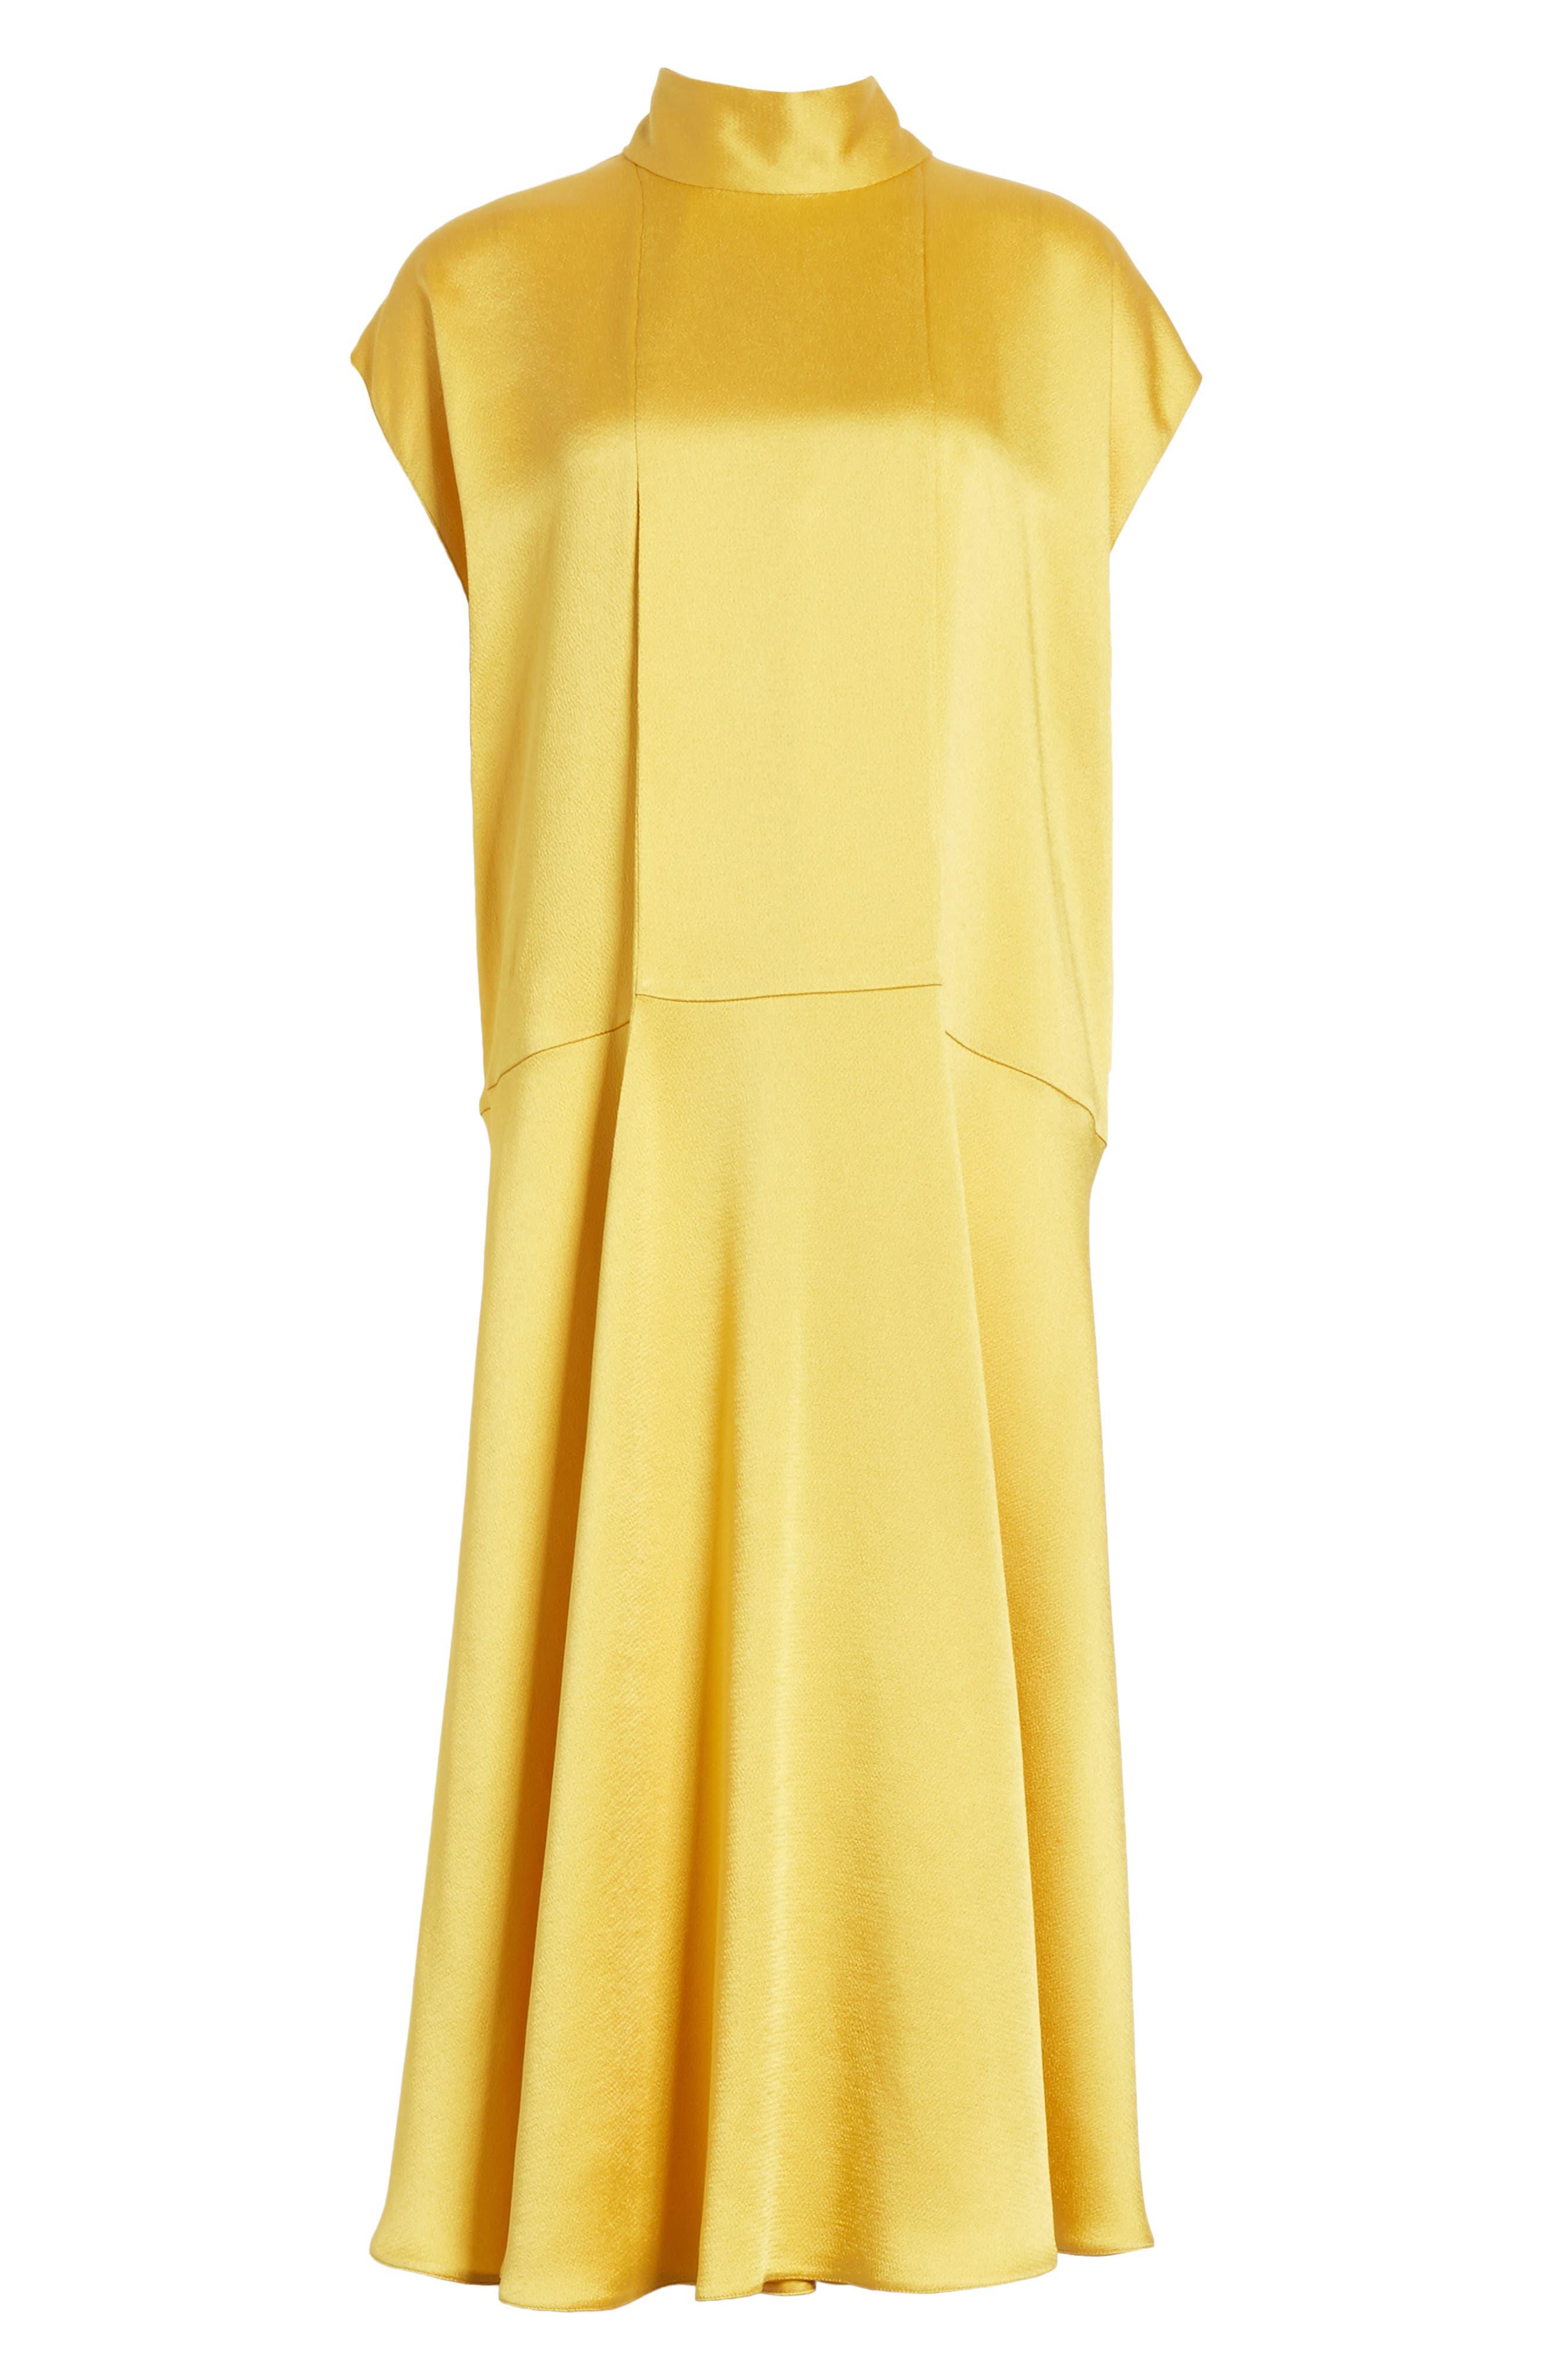 Hammered Satin Midi Dress,                             Alternate thumbnail 6, color,                             Canary Yellow